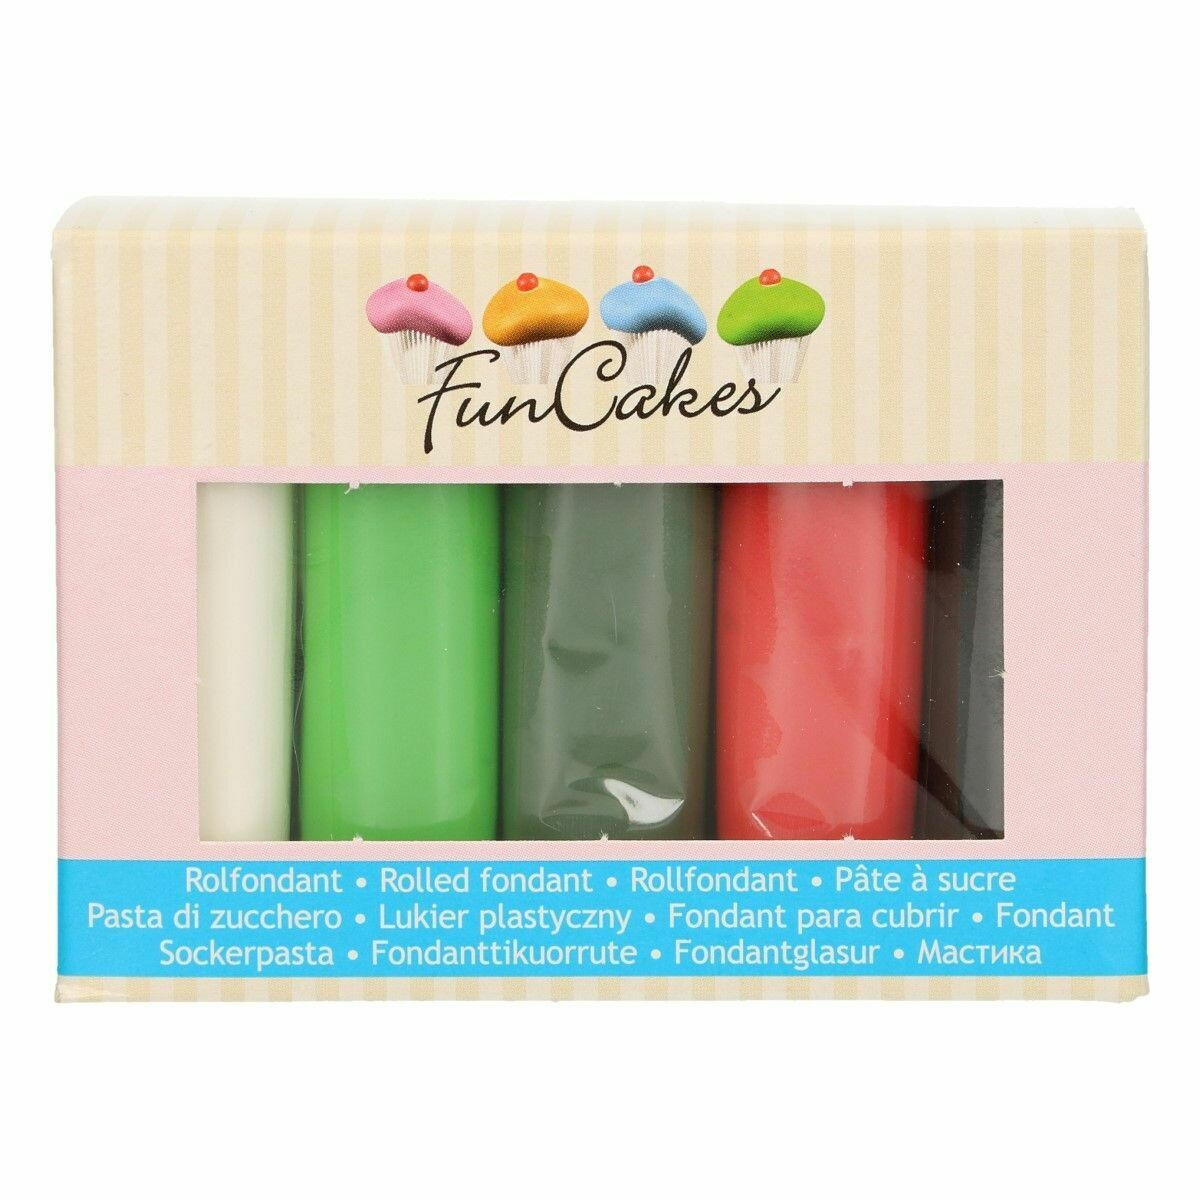 FunCakes Fondant -MULTIPACK -CHRISTMAS 5x100g -  Σετ με 5 Ζαχαρόπαστες - Λευκό, Μαύρο, Ανοιχτό και Σκούρο Πράσινο και Κόκκινο